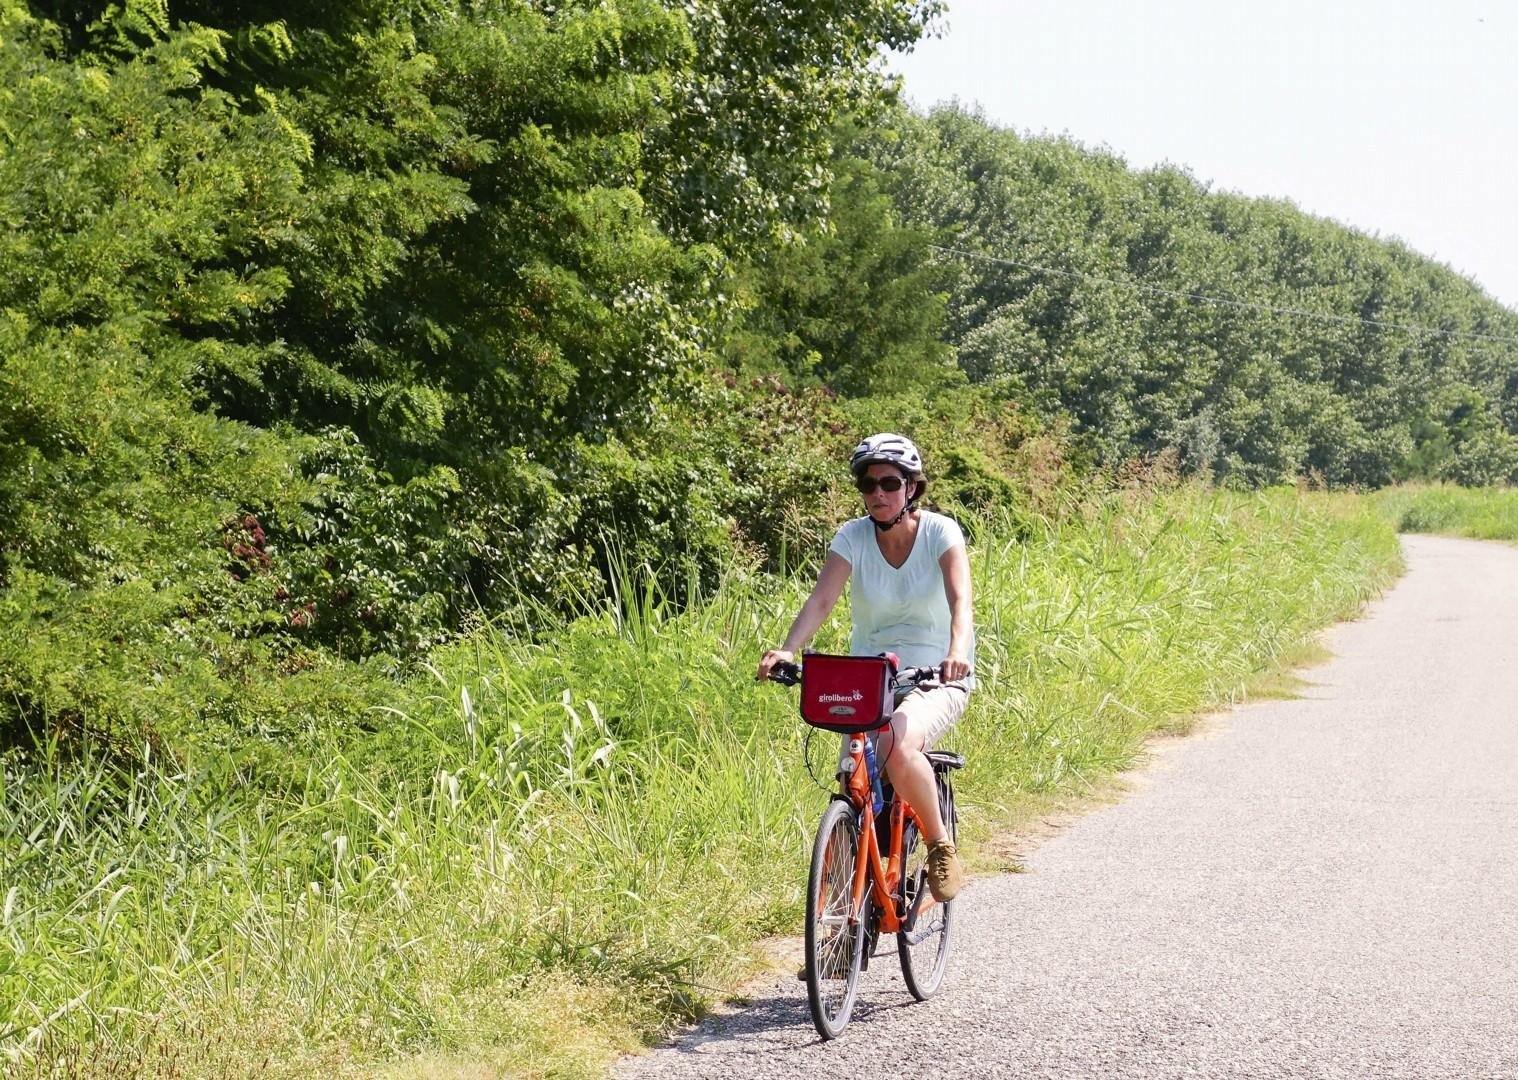 waterwaysofvenice15.jpg - Italy - Venetian Waterways (Venice to Mantova) - Bike and Barge Holiday - Leisure Cycling